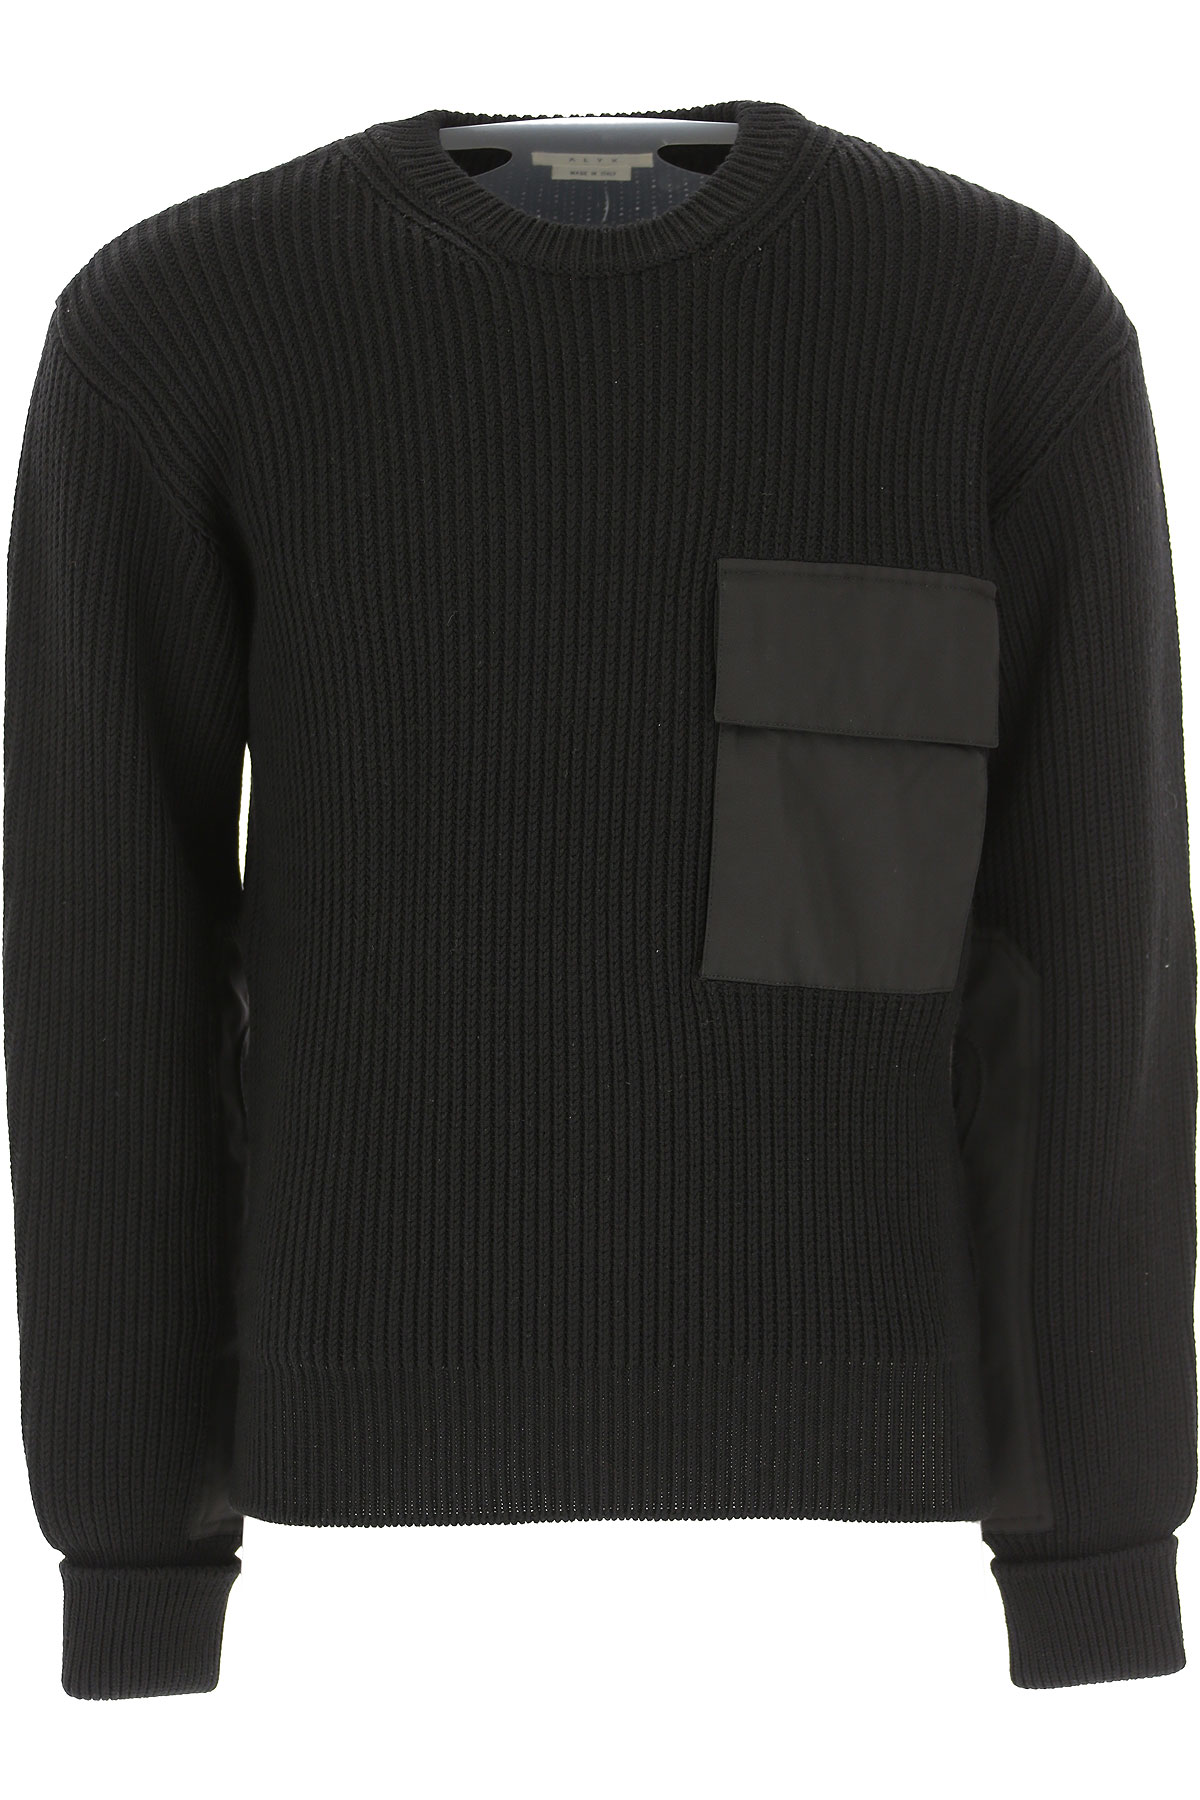 ALYX Sweater for Men Jumper On Sale in Outlet, Black, Wool, 2019, L S